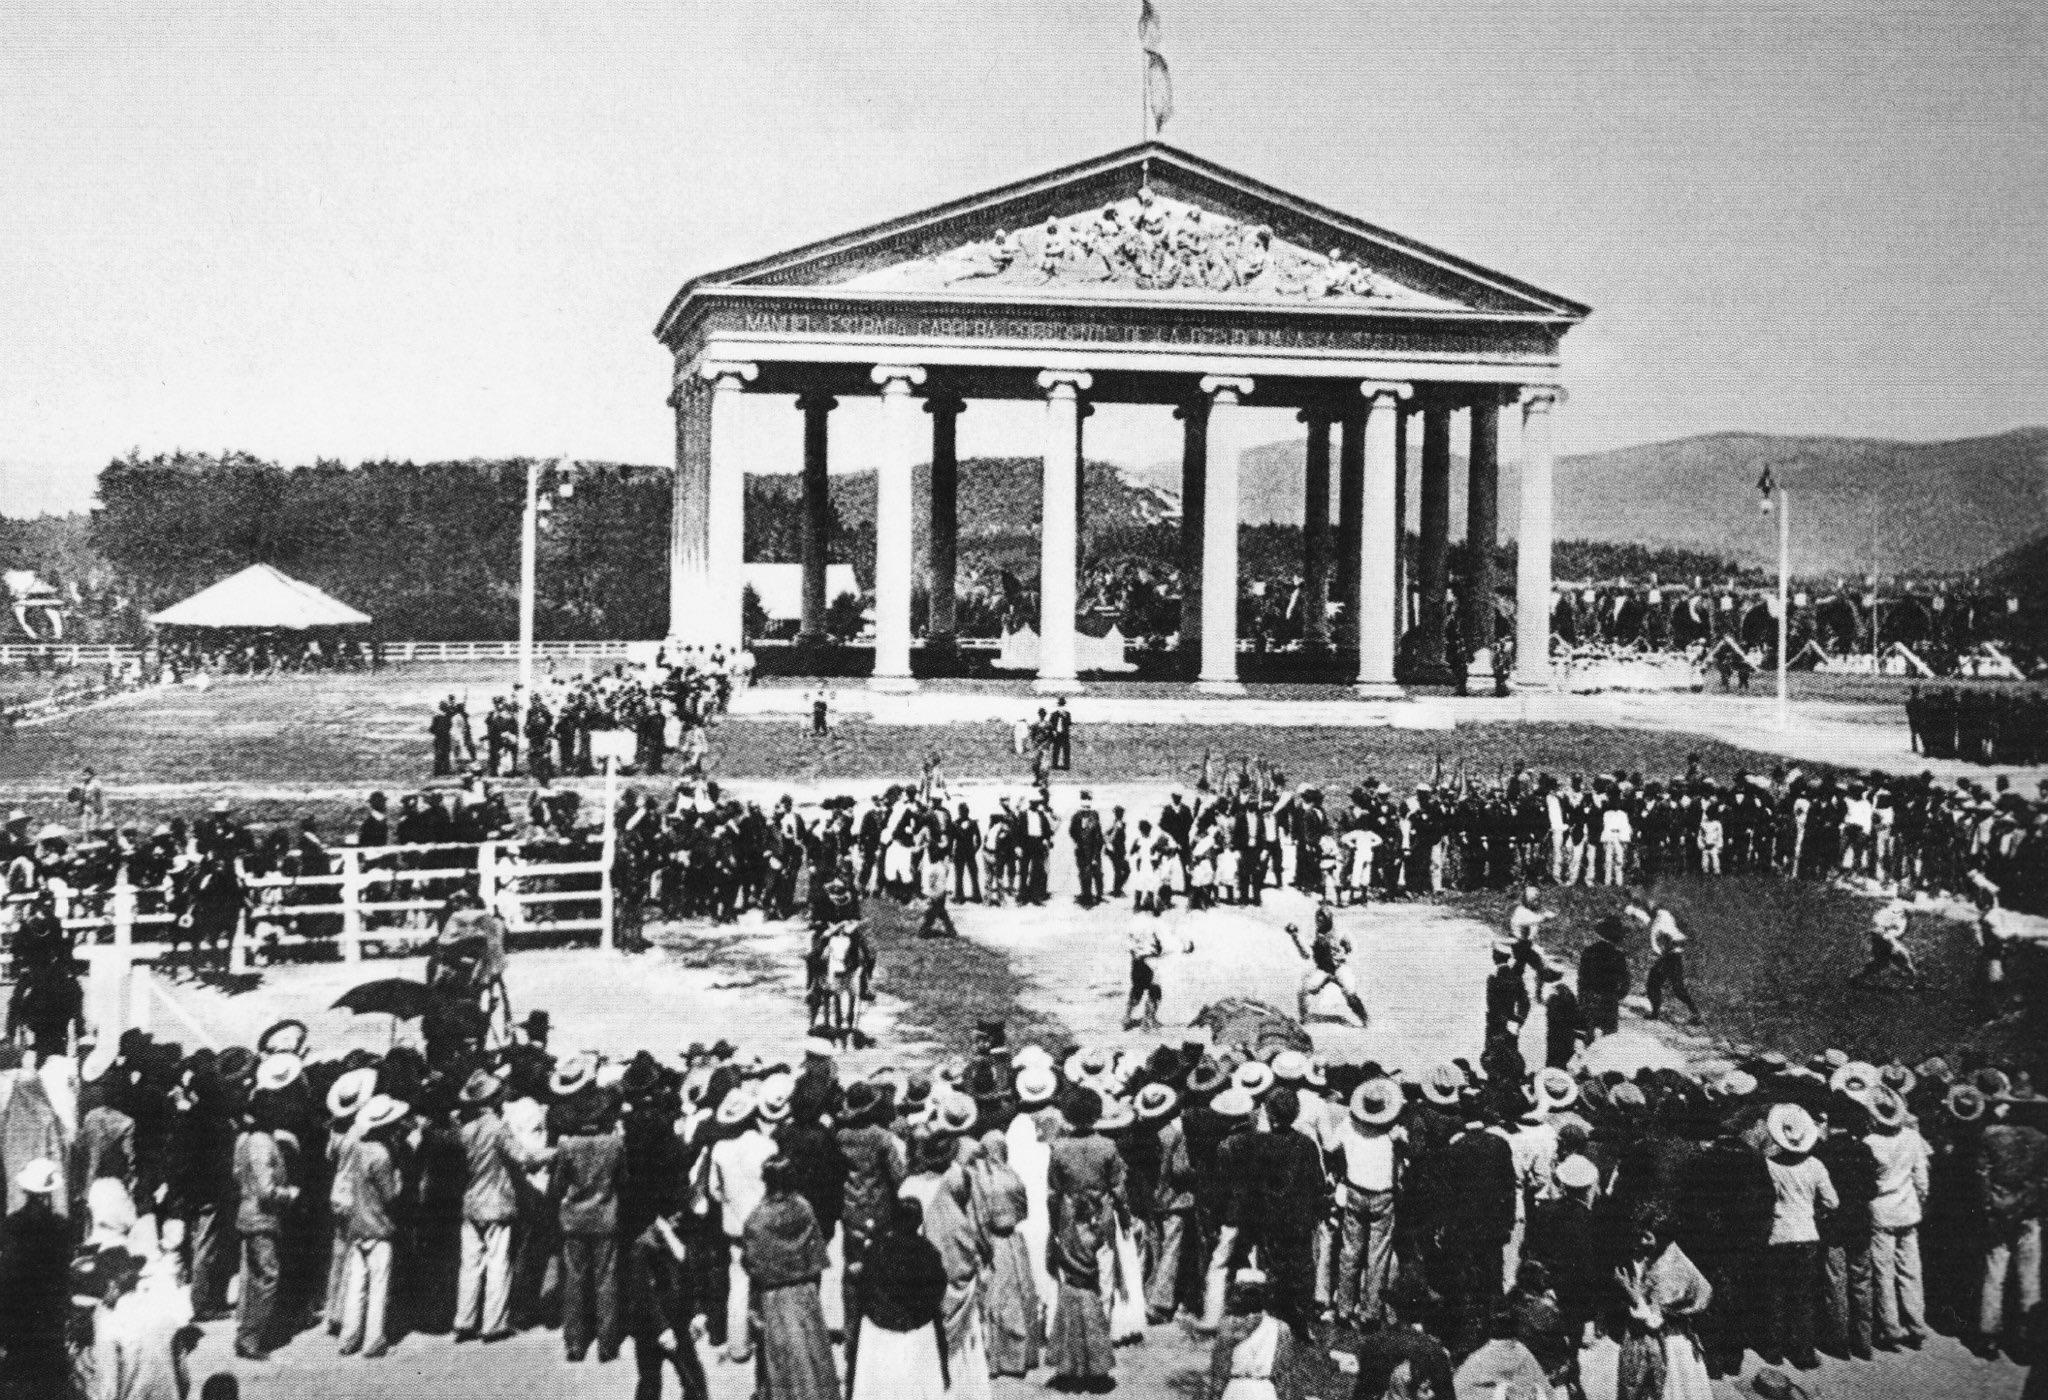 Templo de Minerva, 1901.